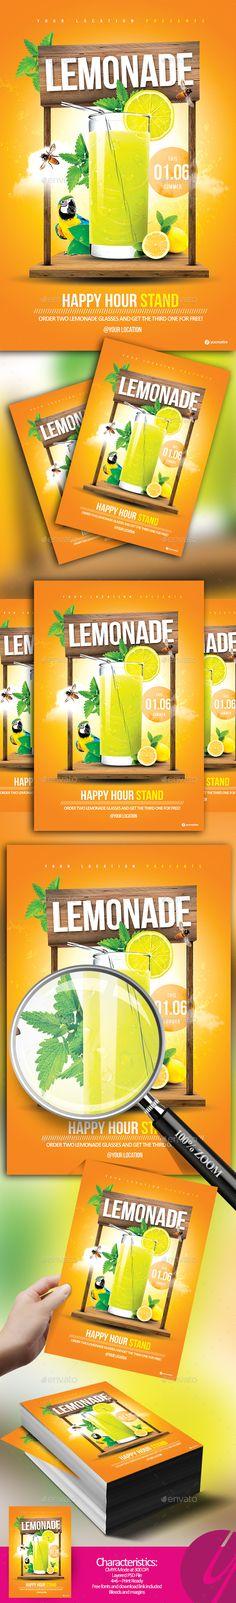 Lemonade Stand Flyer — Photoshop PSD #fruit #lemonade • Download ➝ https://graphicriver.net/item/lemonade-stand-flyer/19977162?ref=pxcr